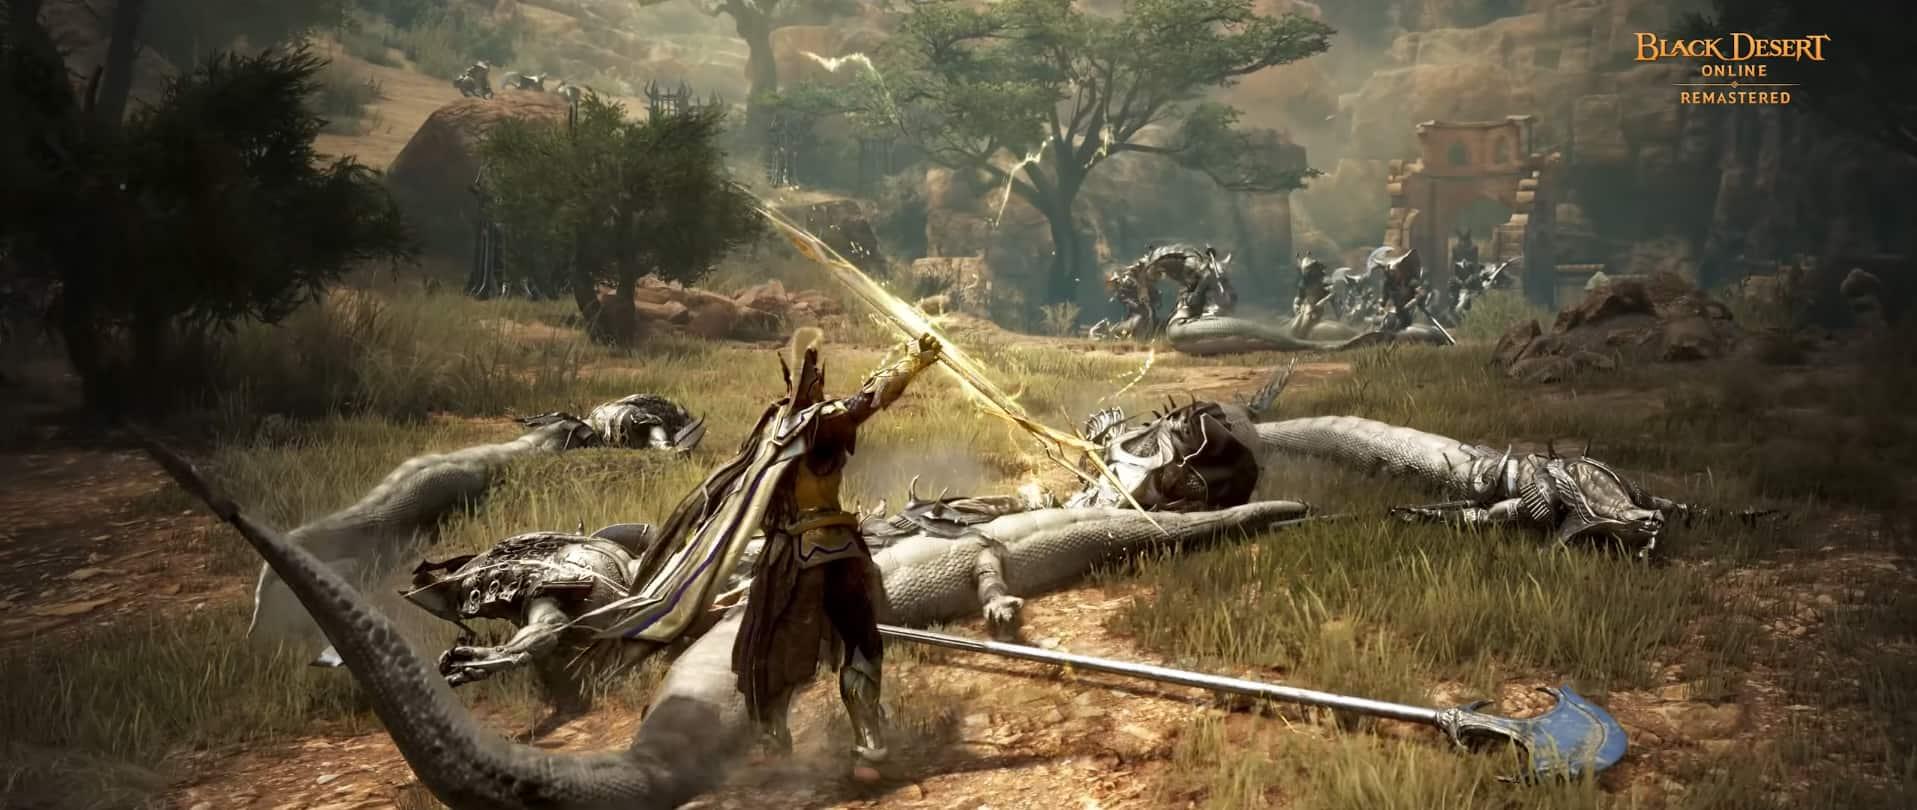 Black Desert Online Previews The Sage Awakening Coming April 21st 1